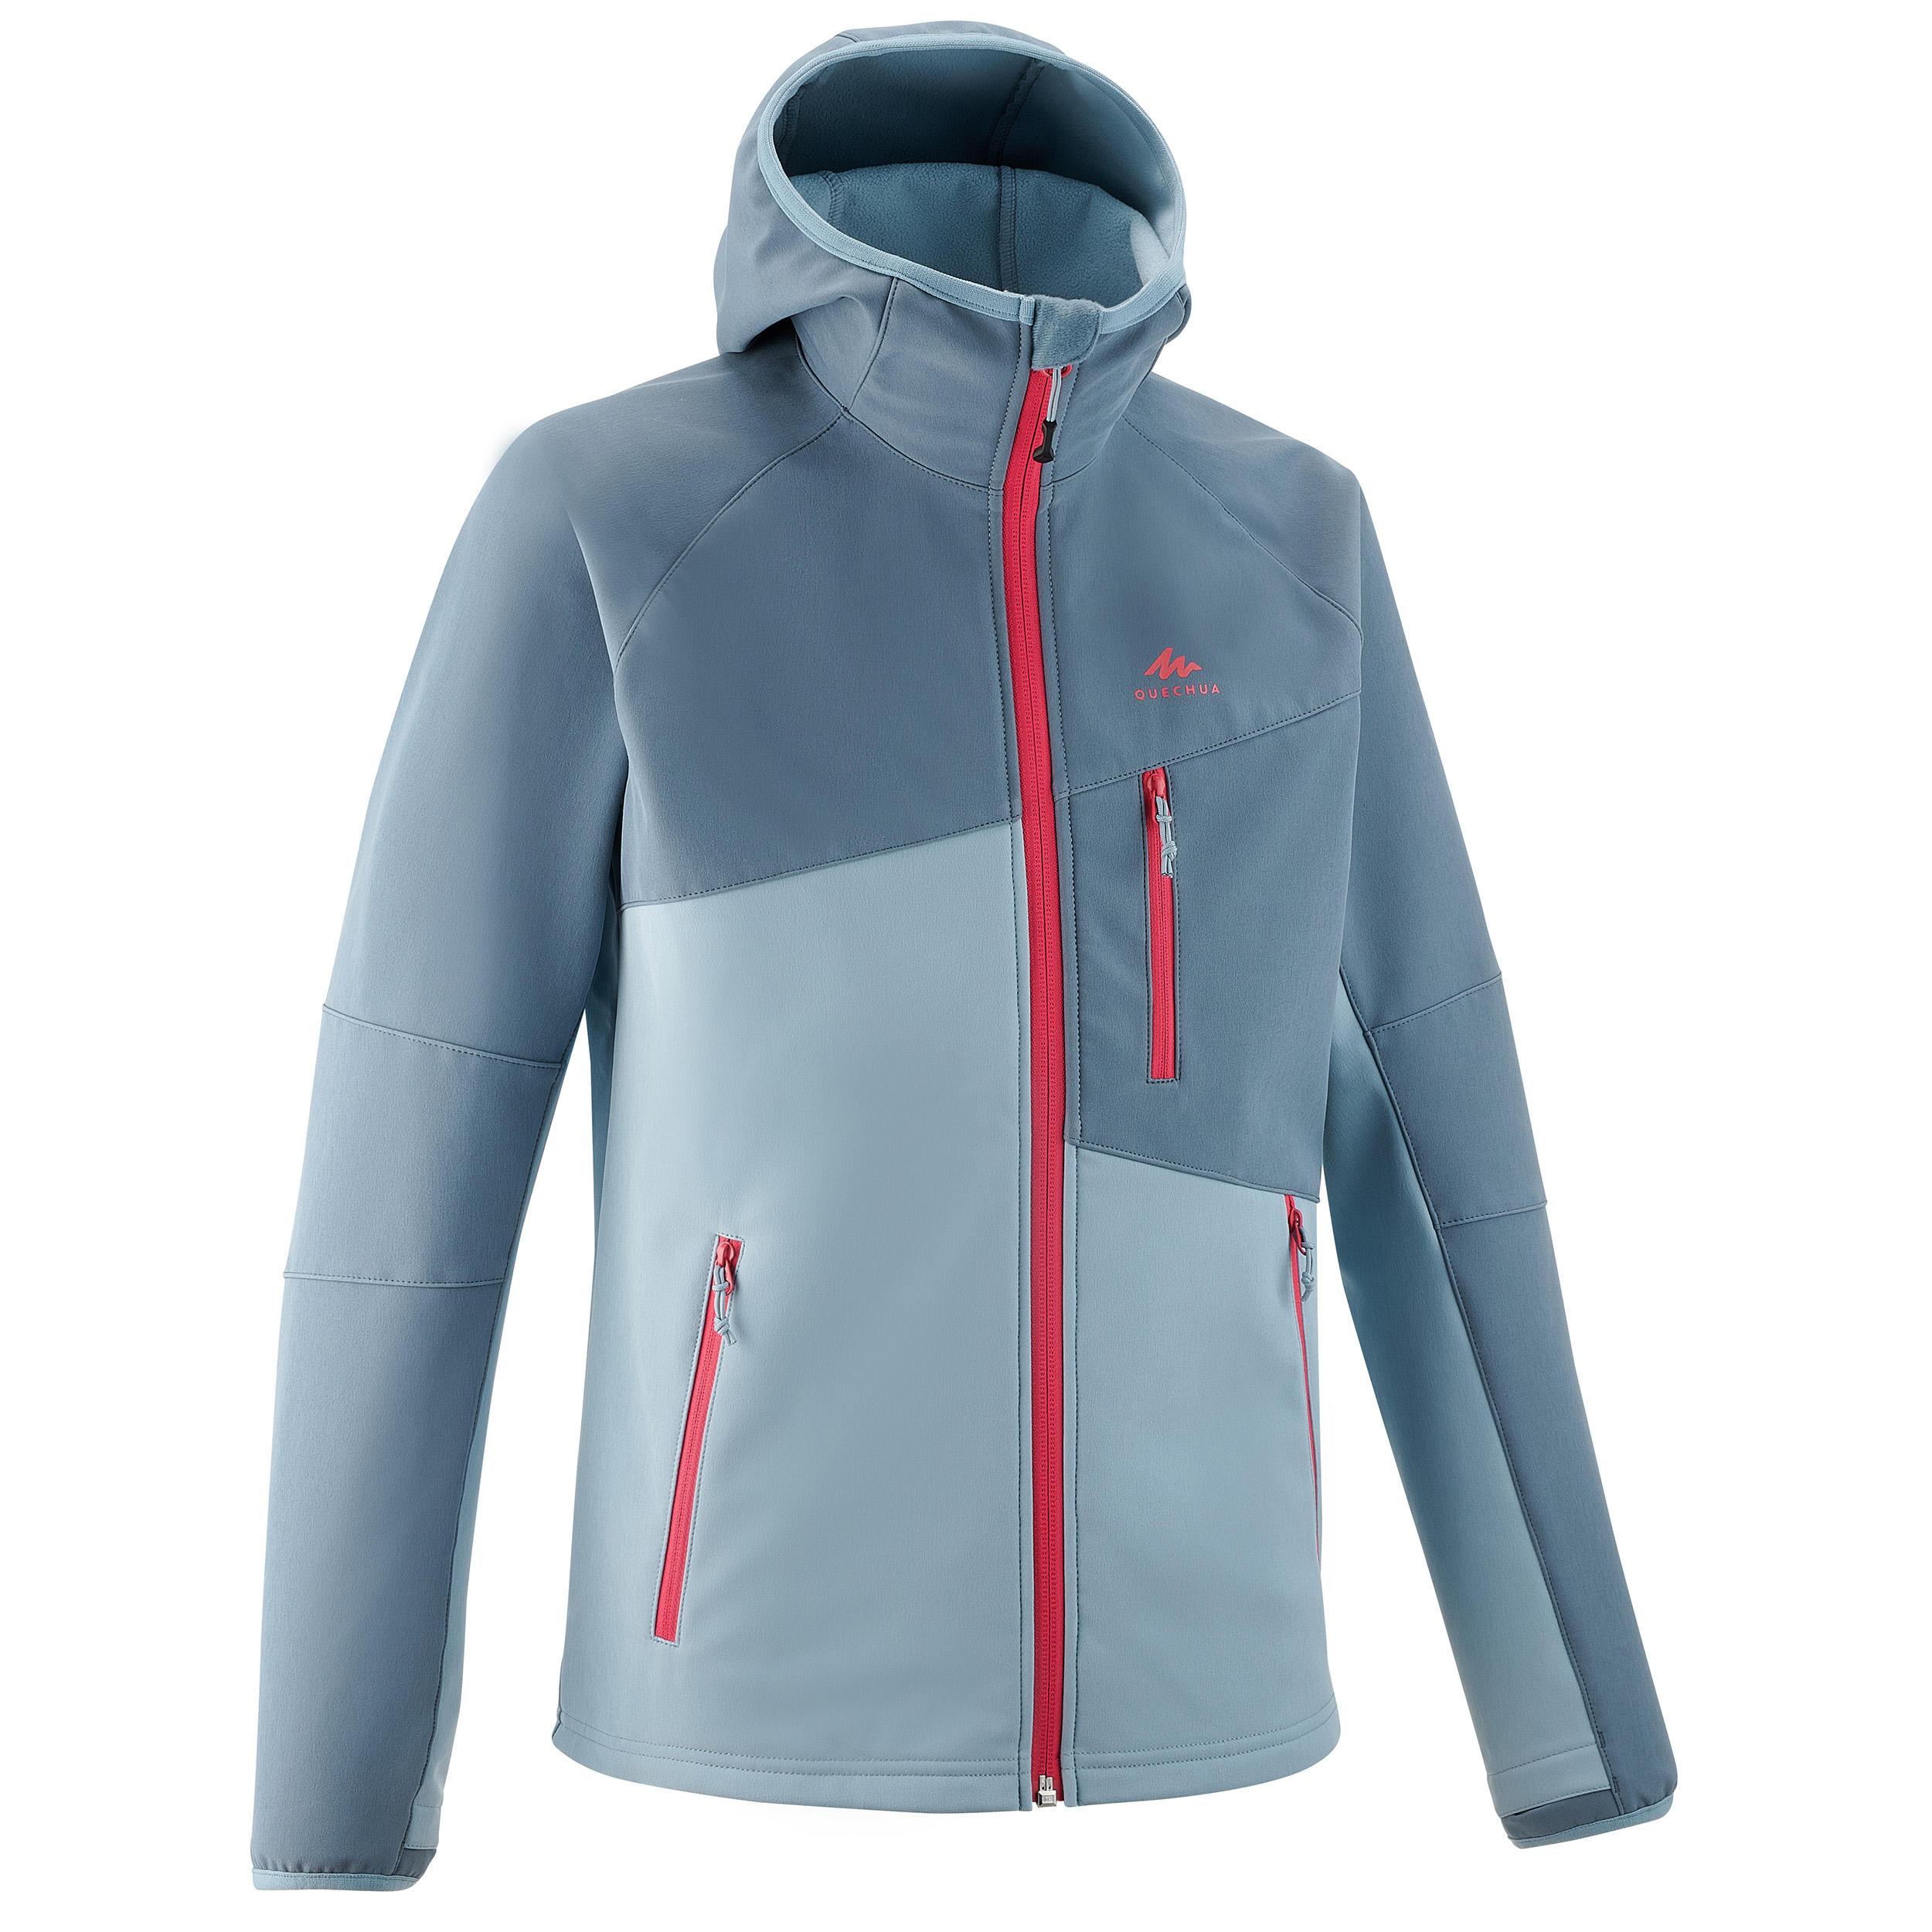 Jachetă Softshell MH500